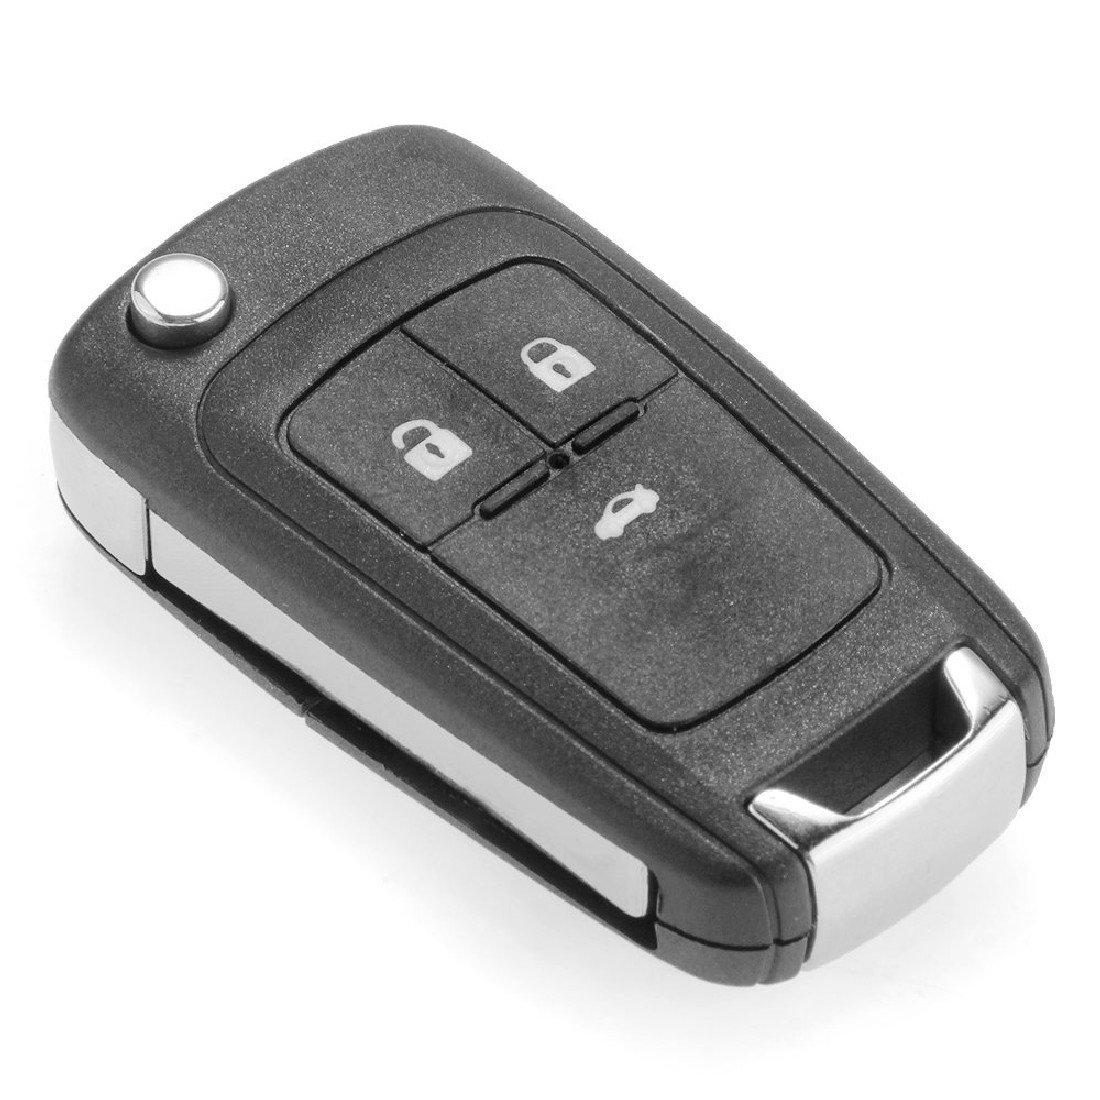 Llave de repuesto para coches con control remoto para Chevrolet Cruze Aveo Aoto, tamaño mini.